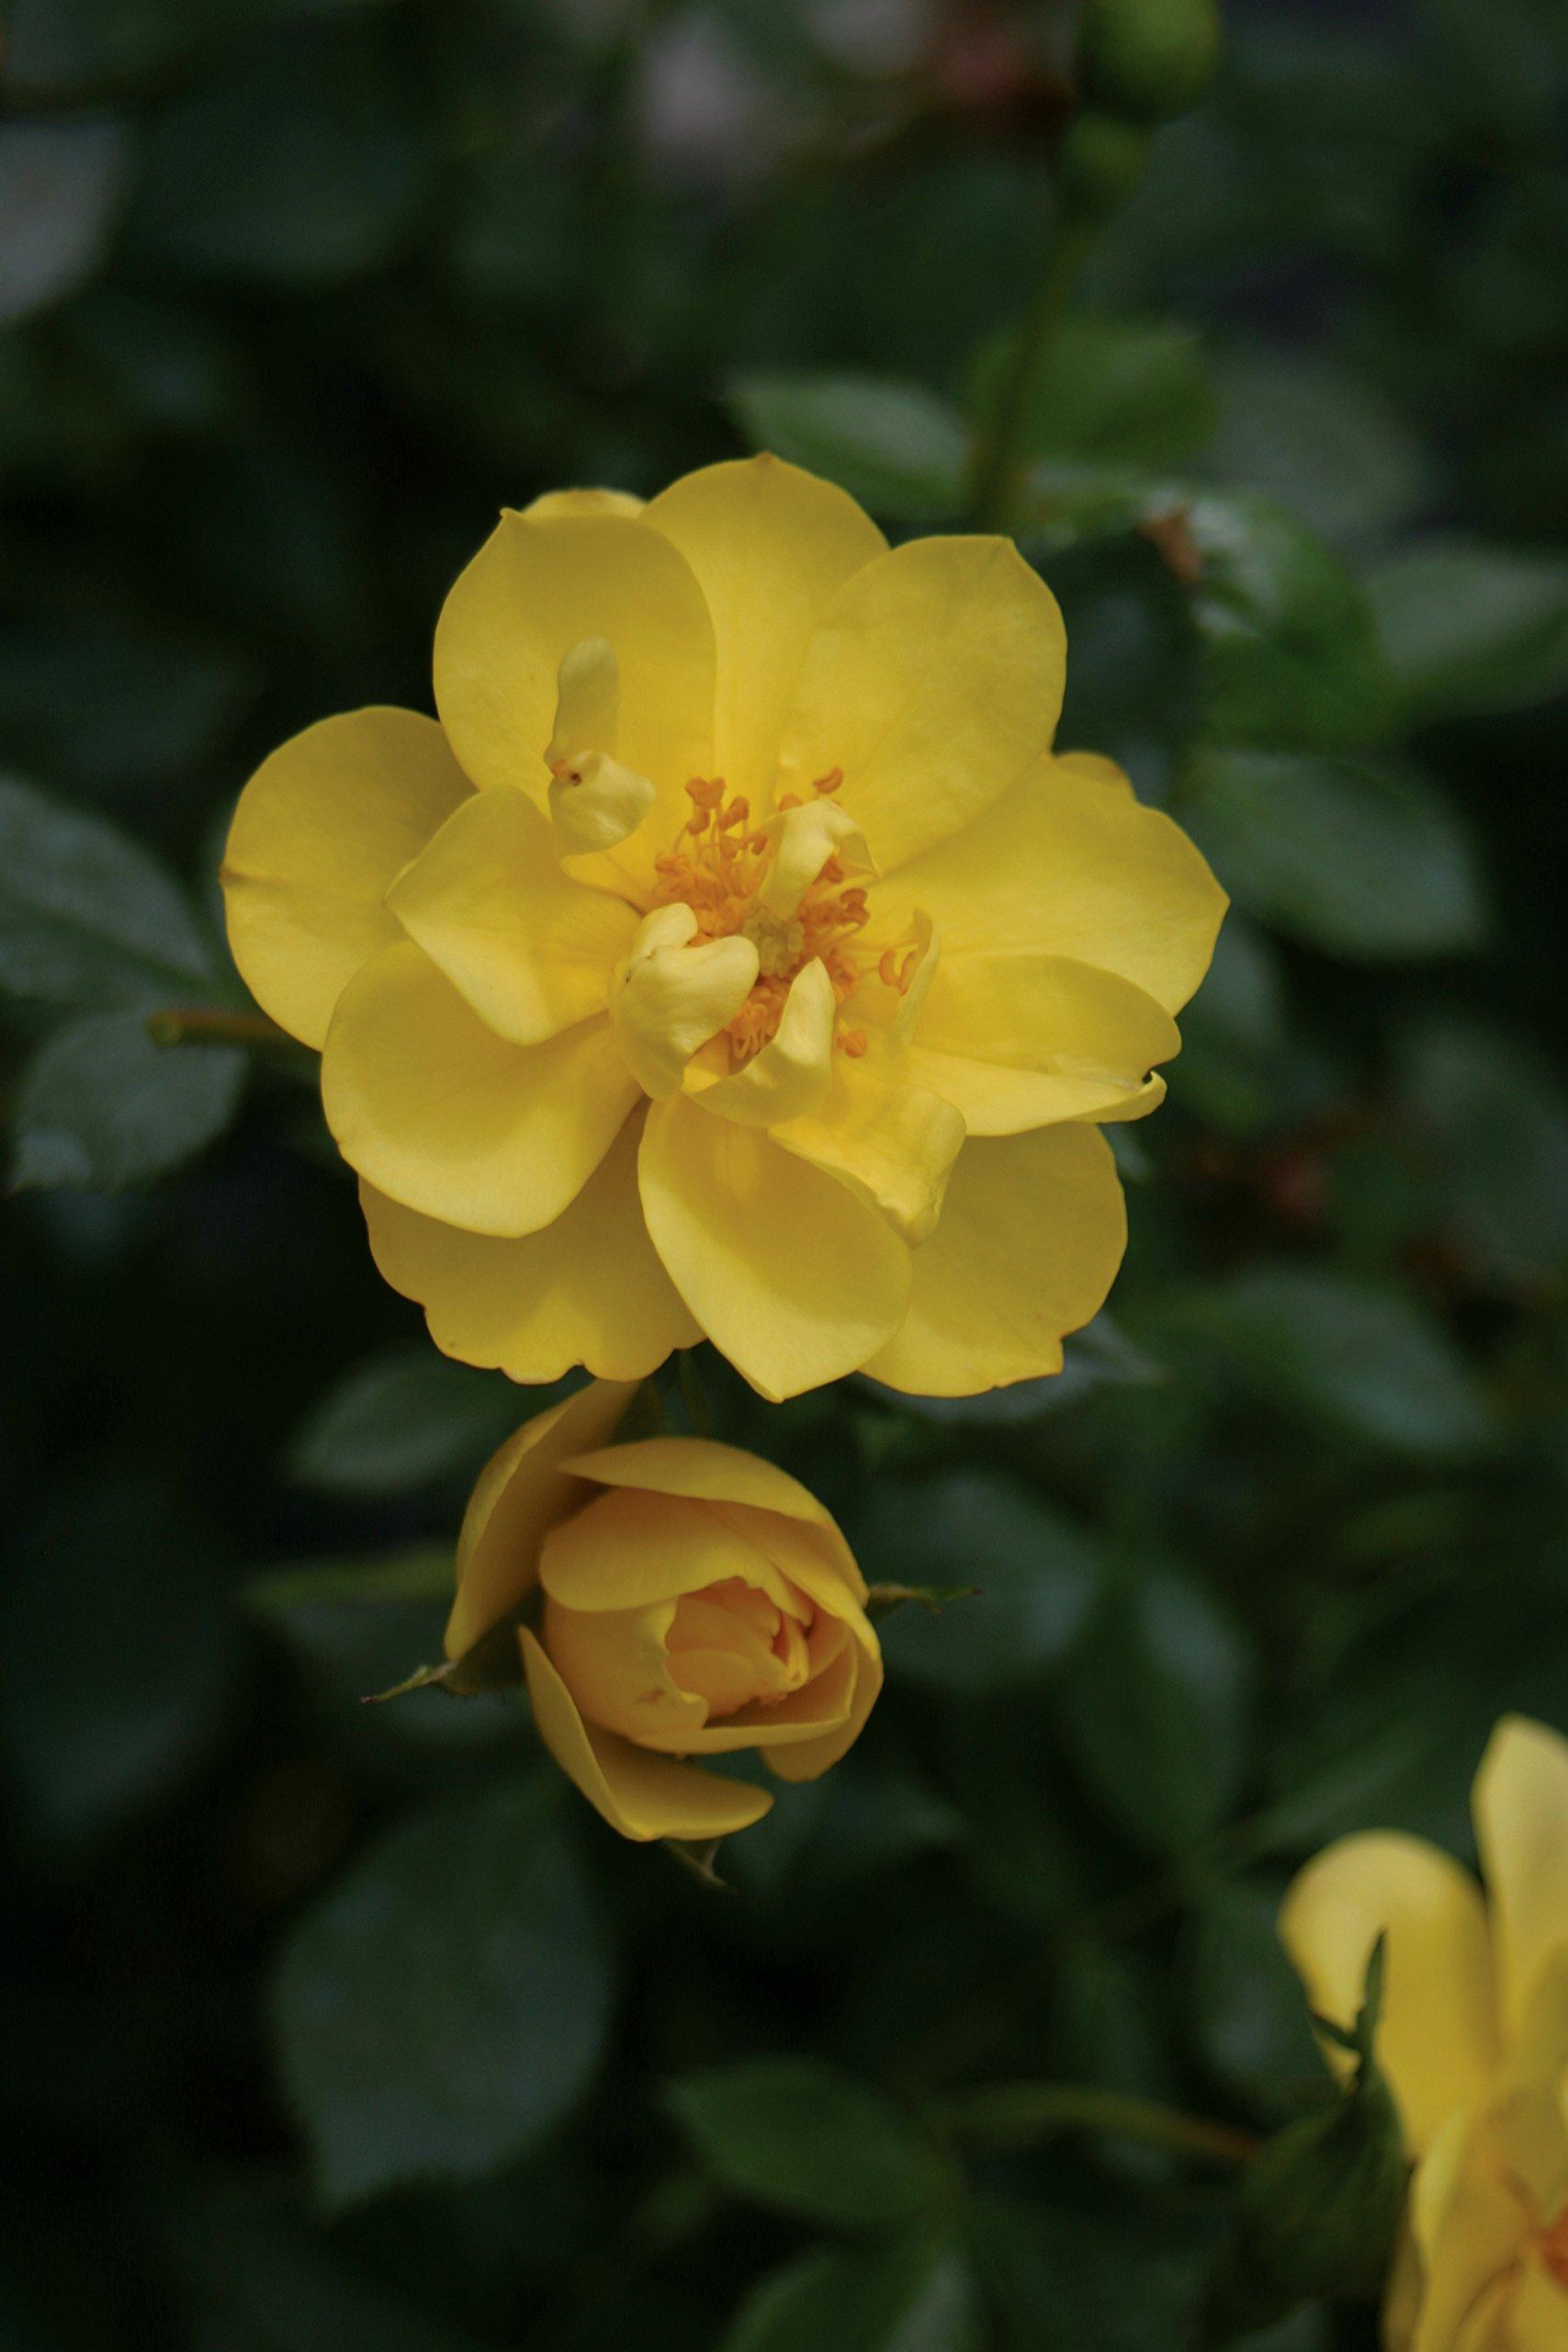 3 Gal. Oso Easy Lemon Zest Landscape Rose (Rosa) Live Shrub, Yellow Flowers by Proven Winners (Image #2)